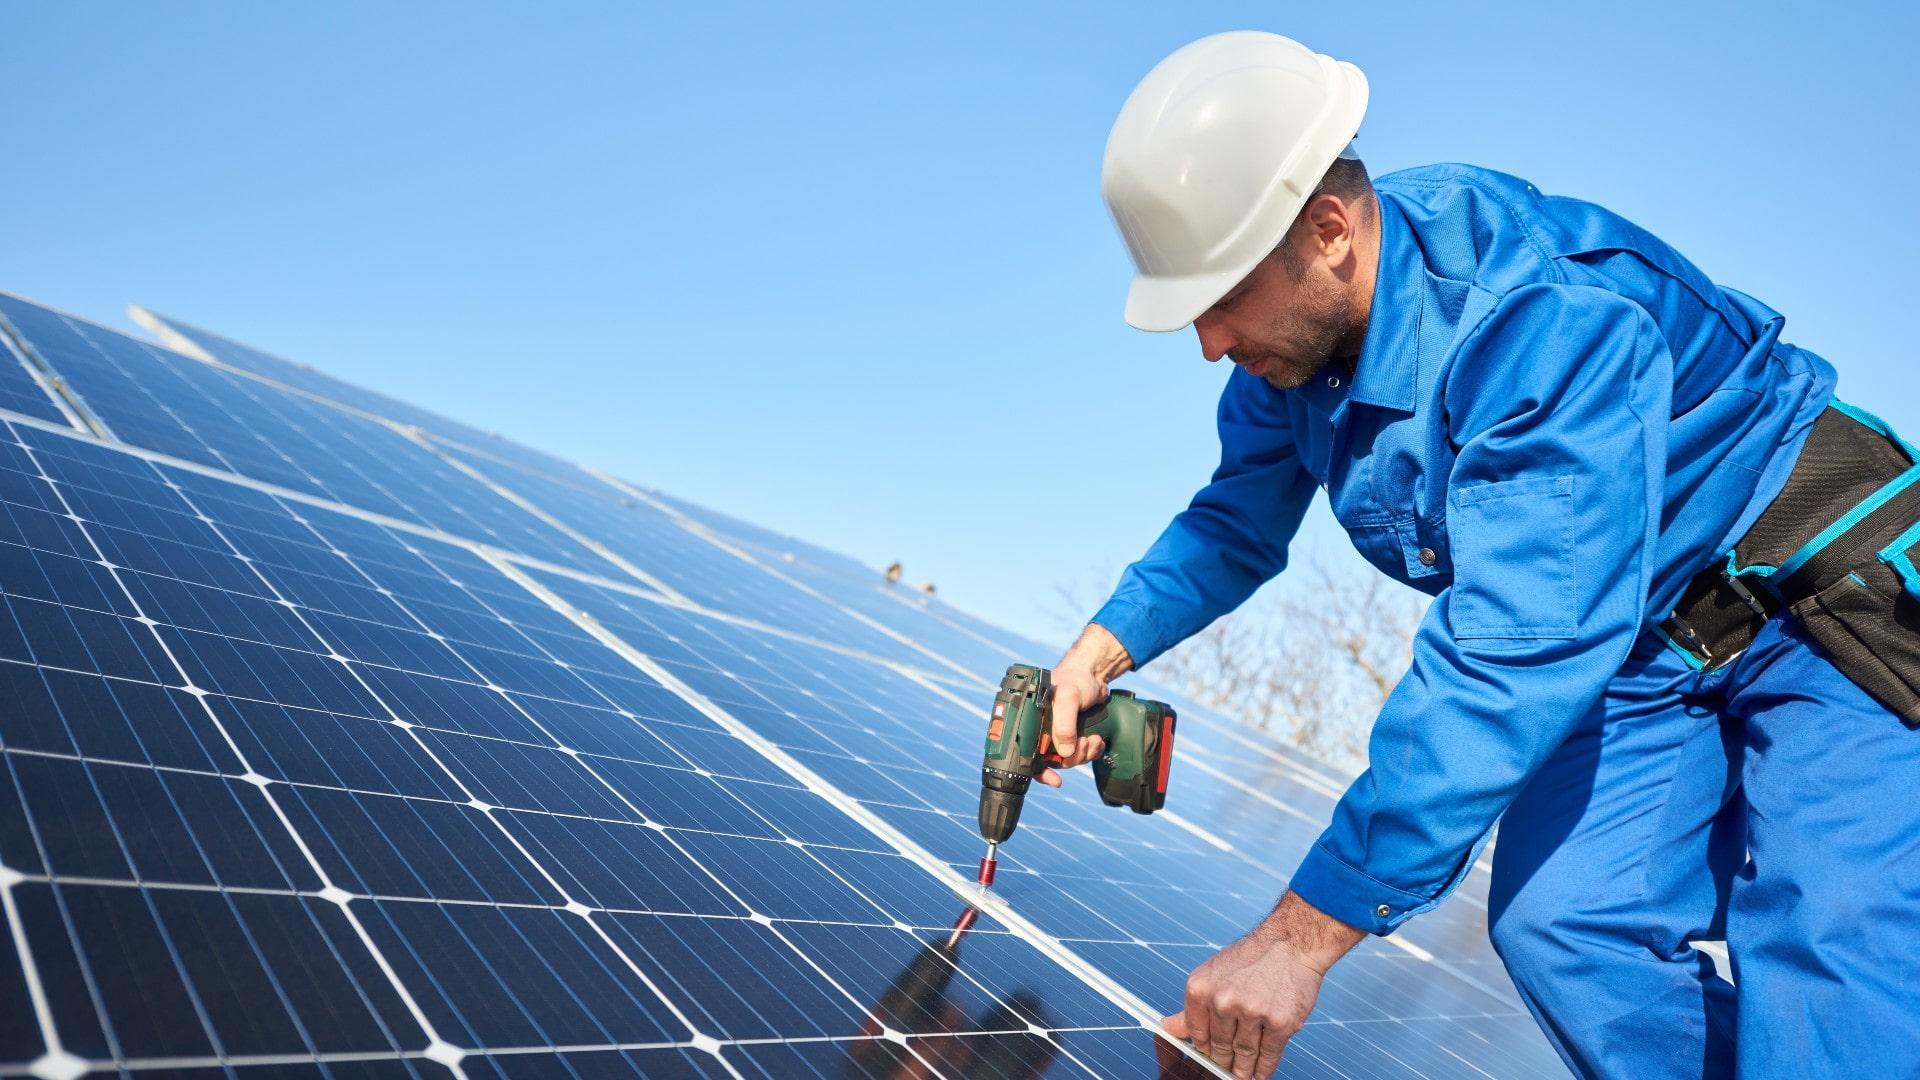 Photovoltaique avenir